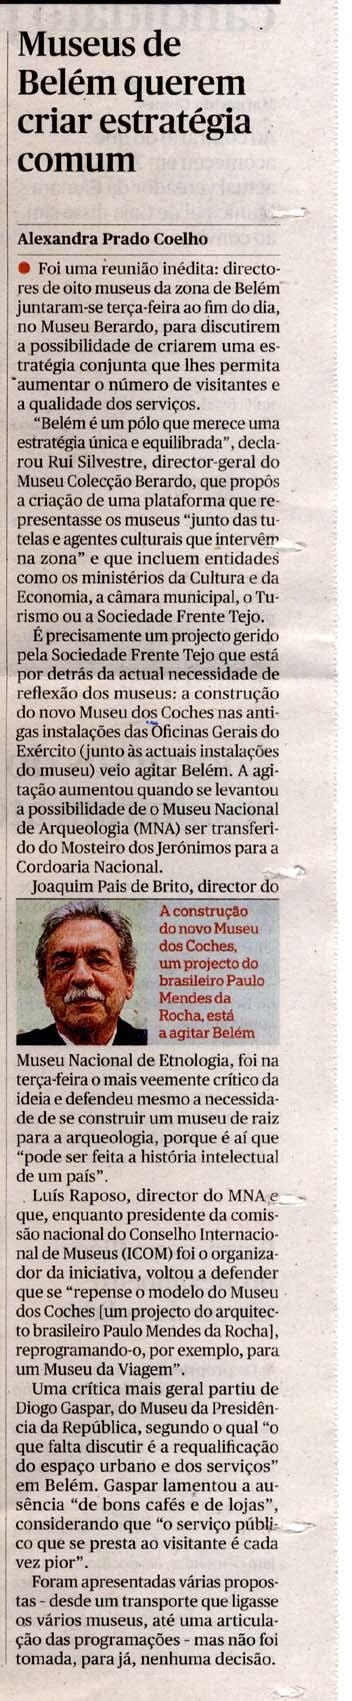 2009.05.21_1_Publico_pag_23